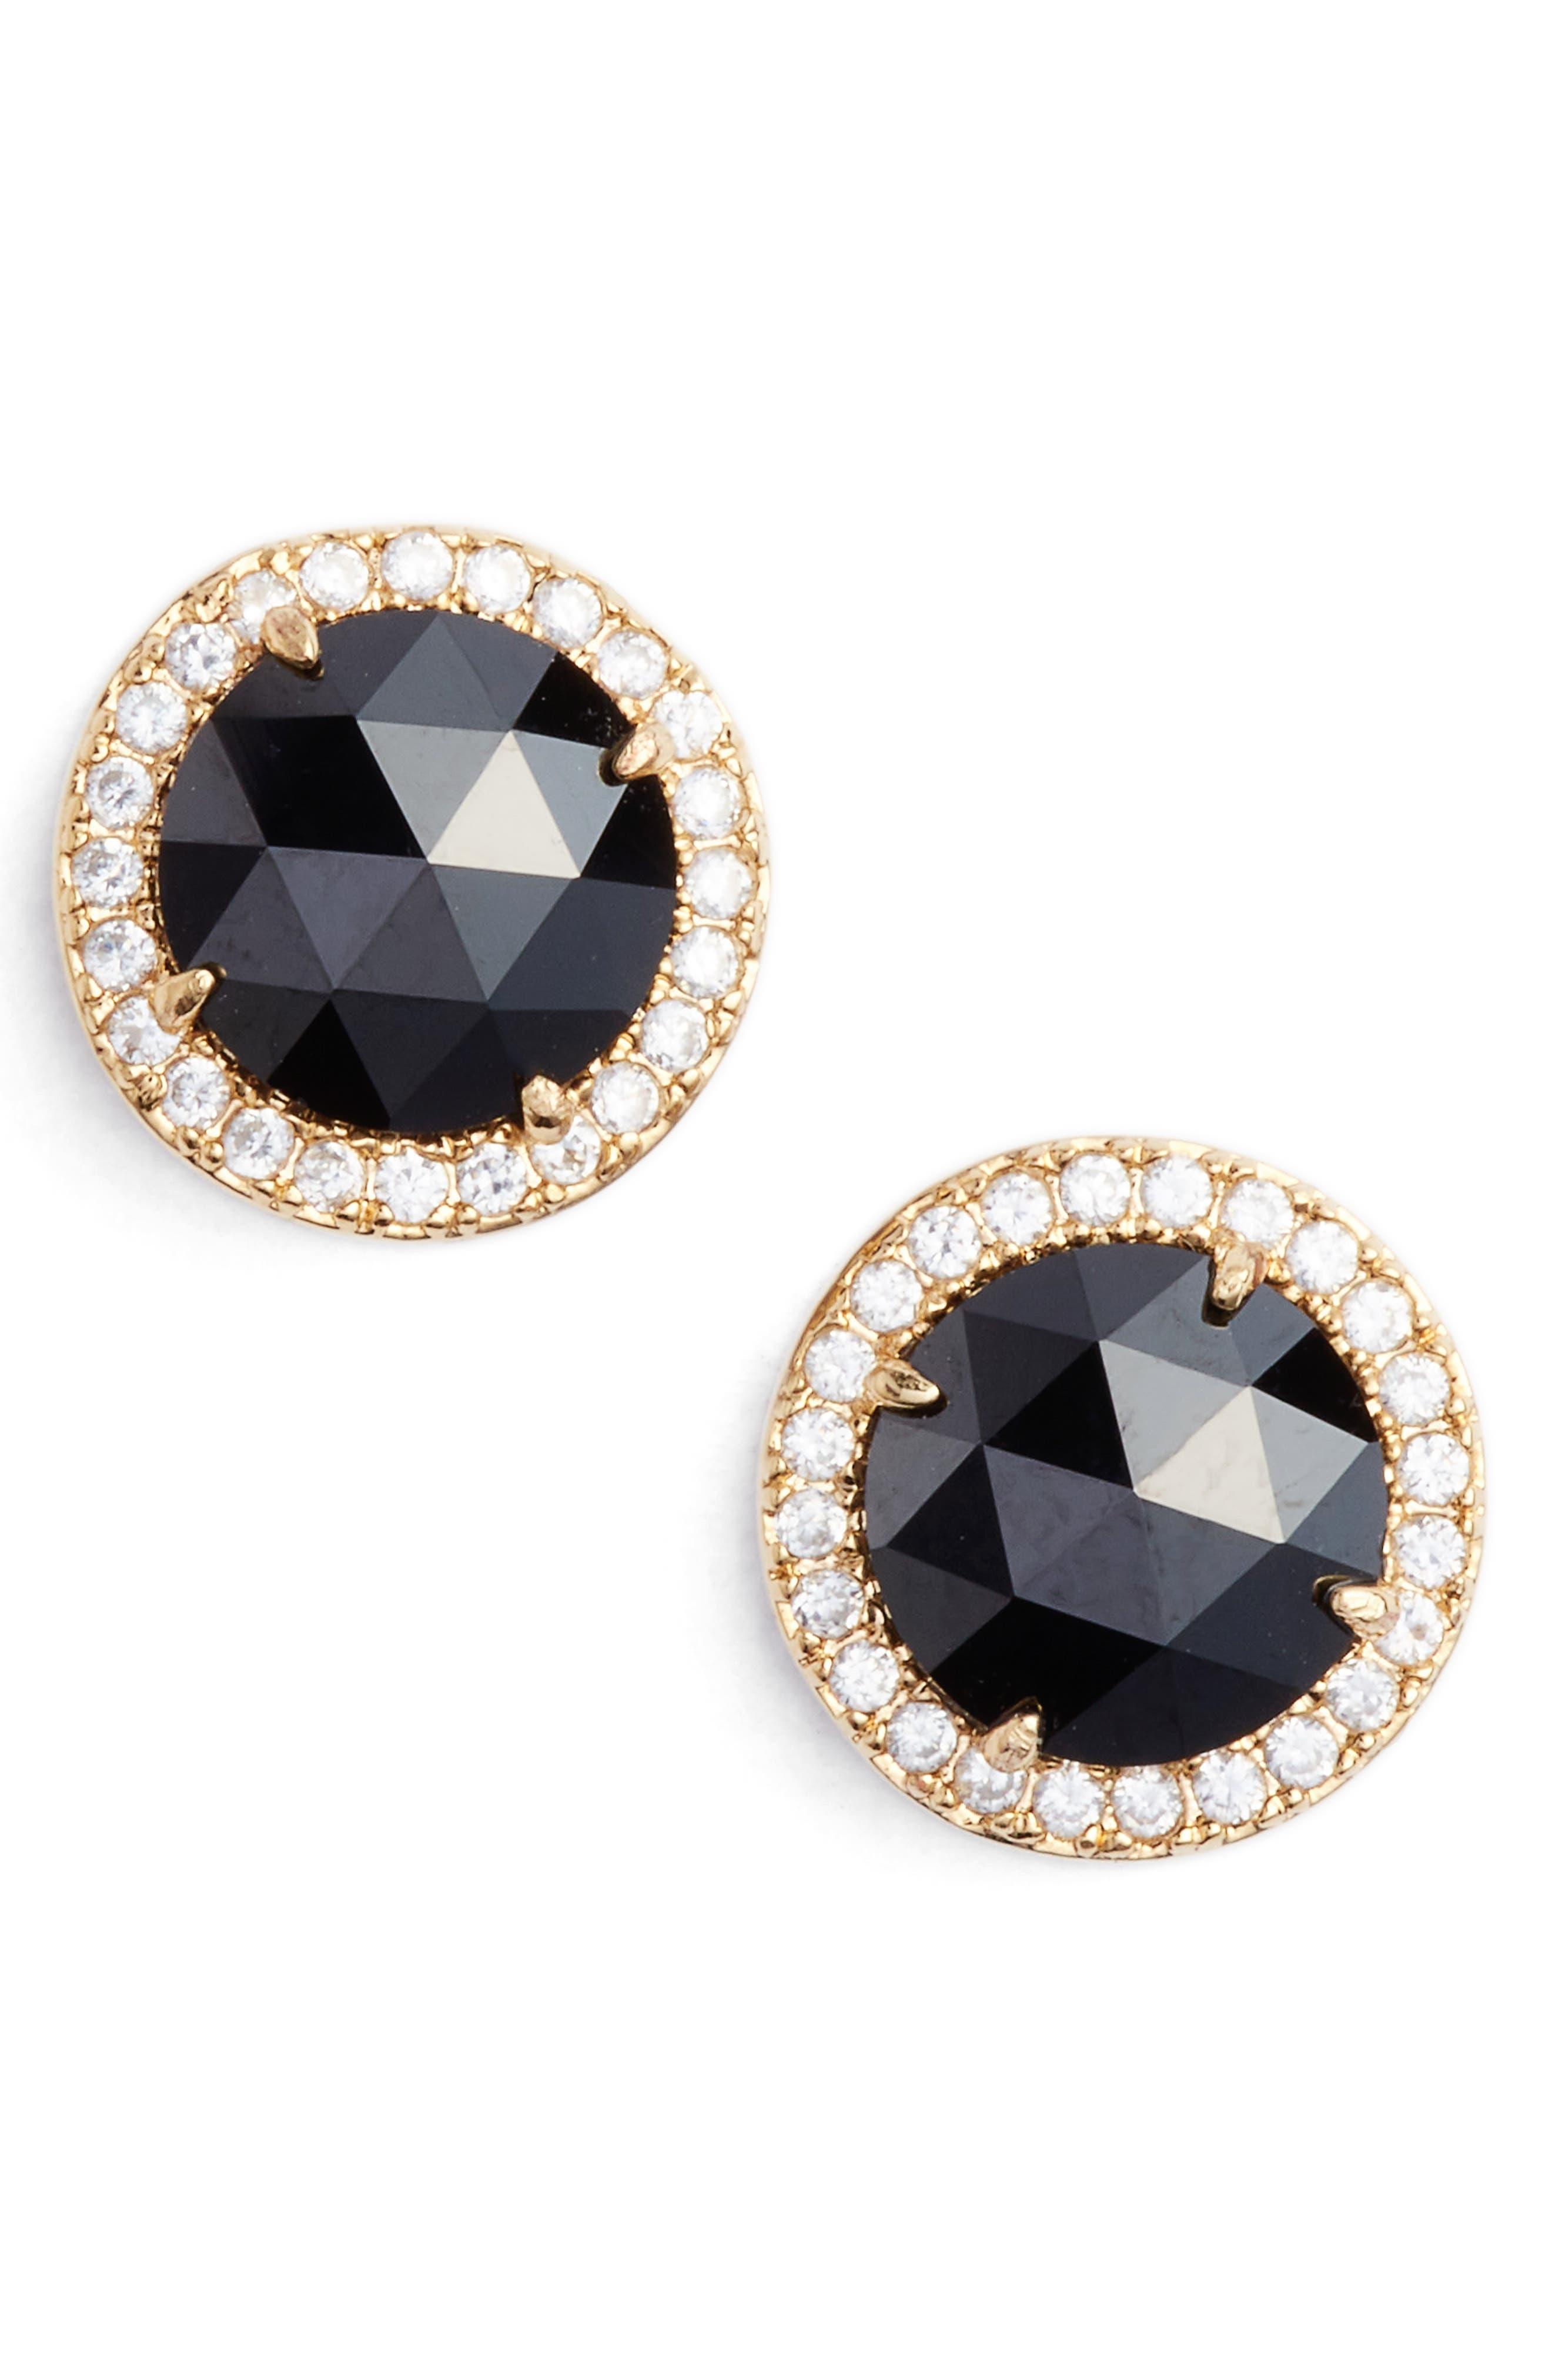 KATE SPADE NEW YORK bright ideas pavé halo stud earrings, Main, color, JET